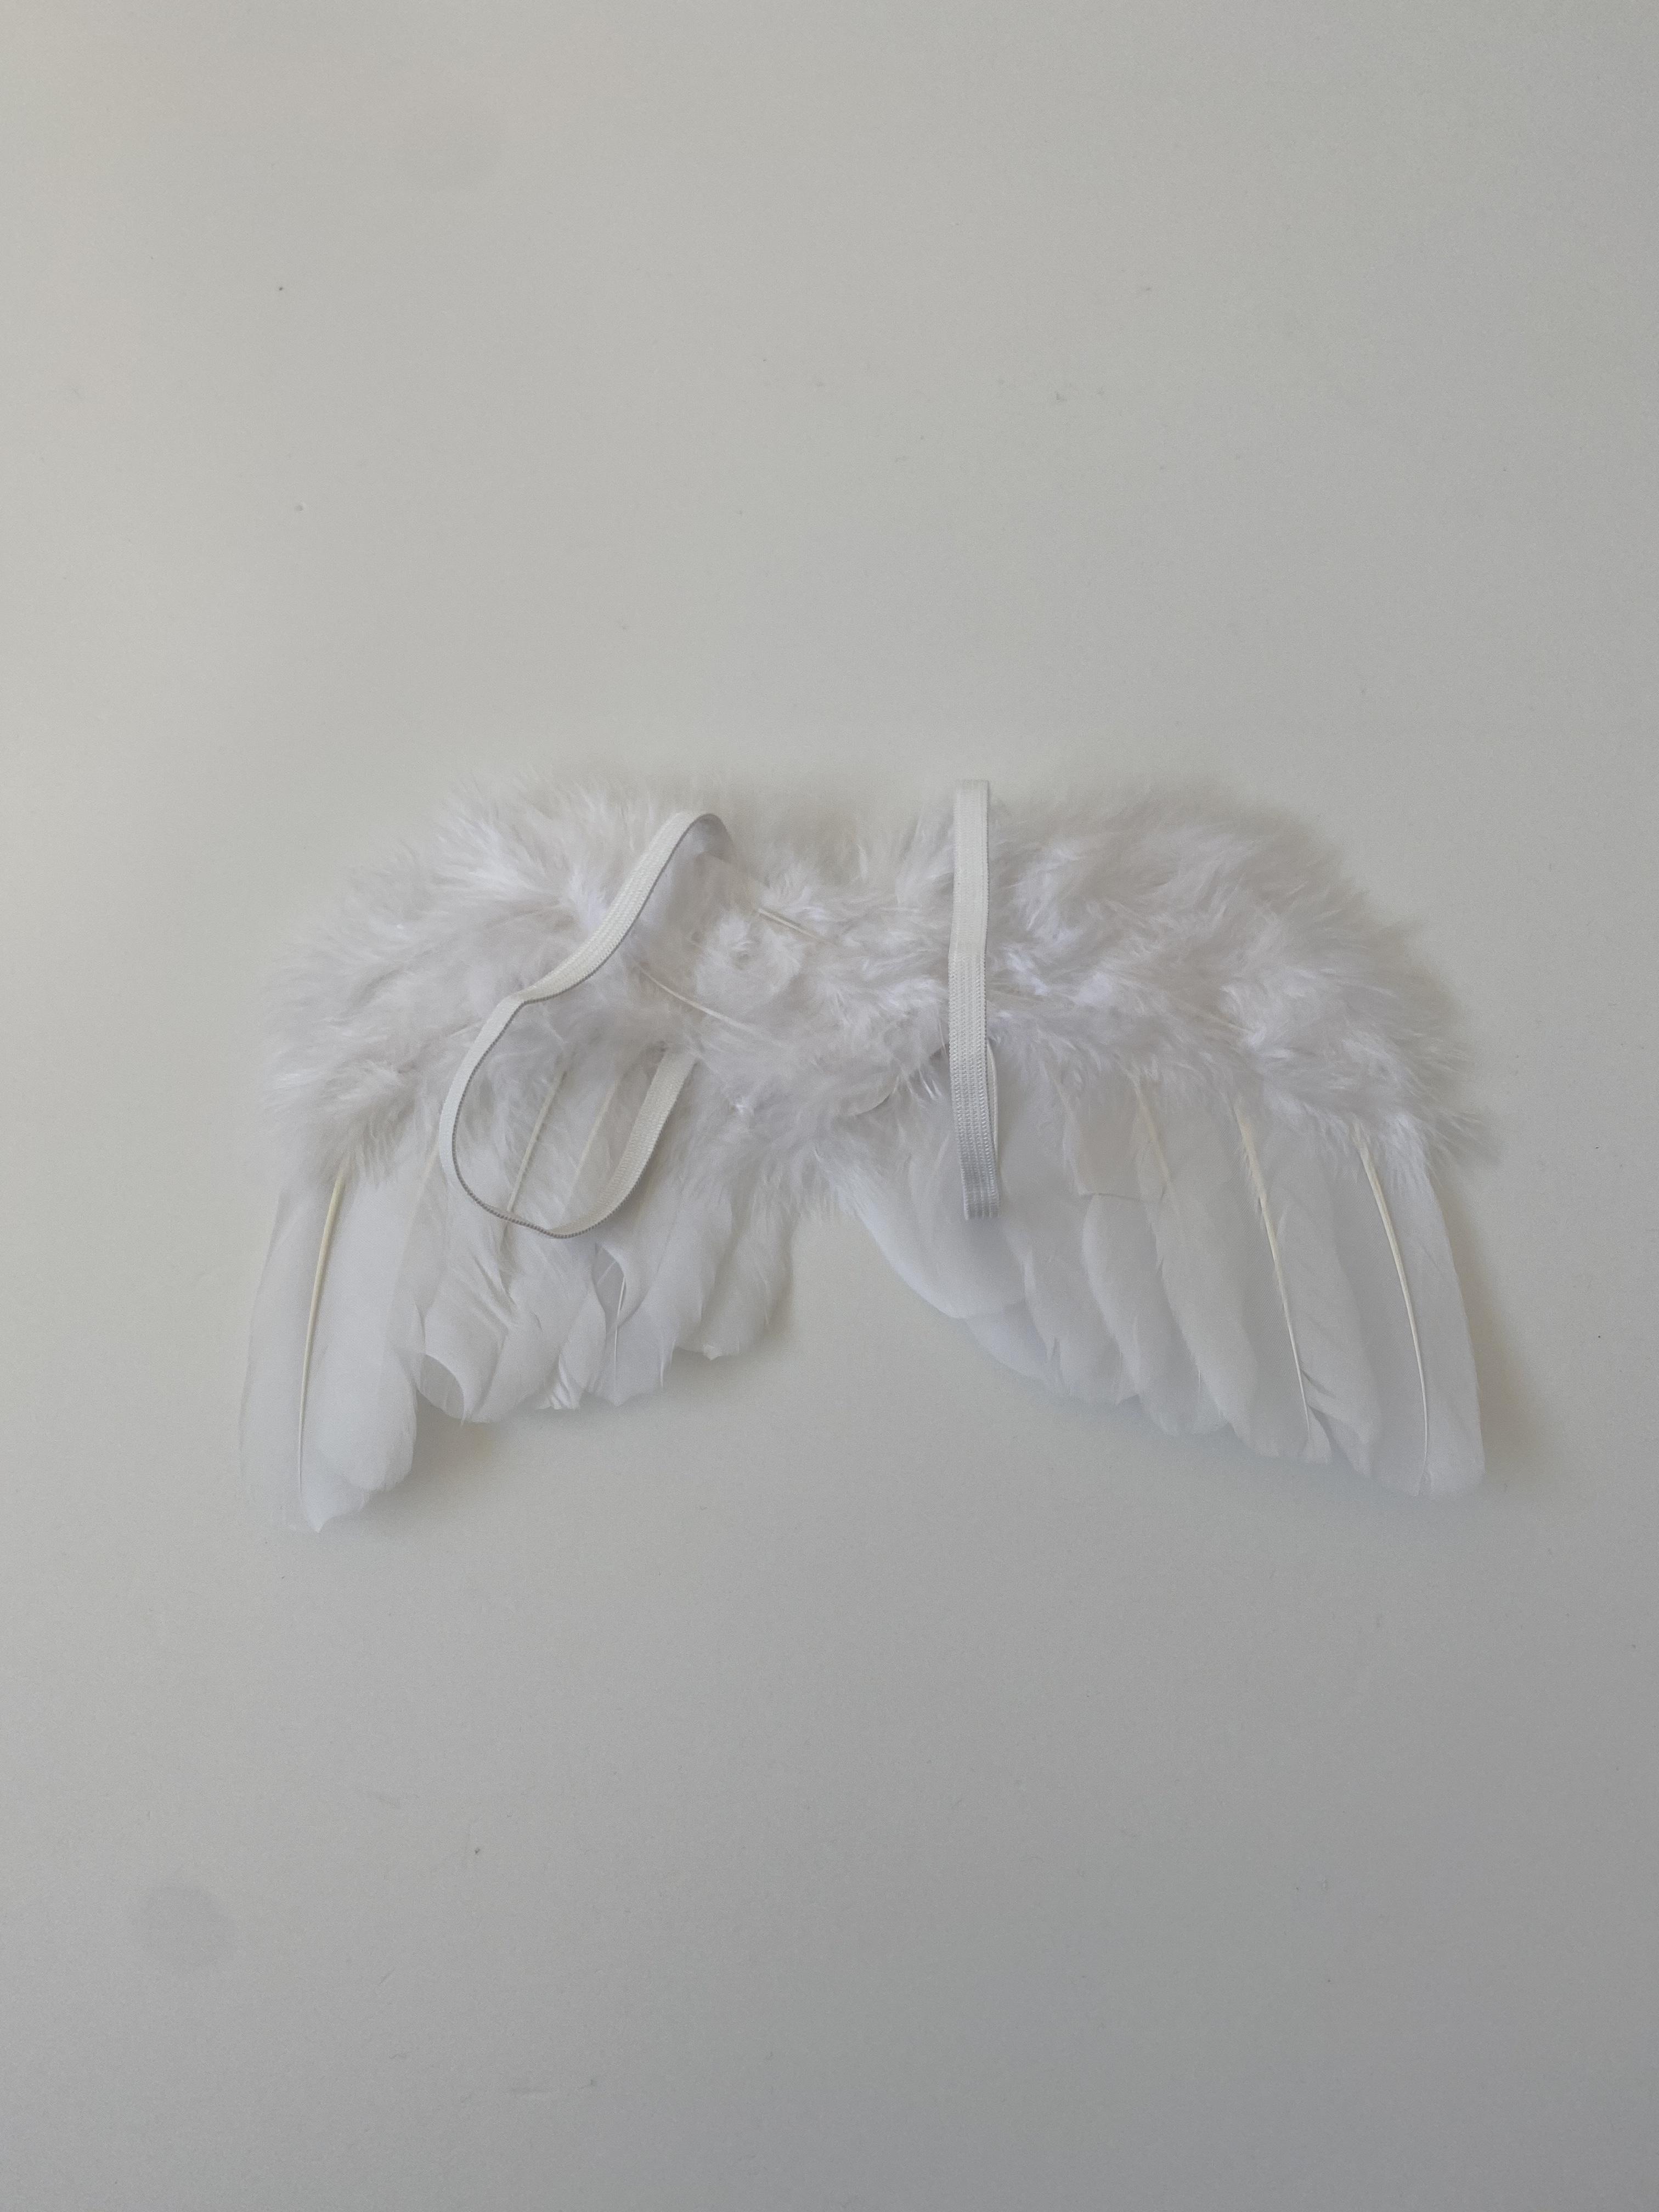 angel 's wing